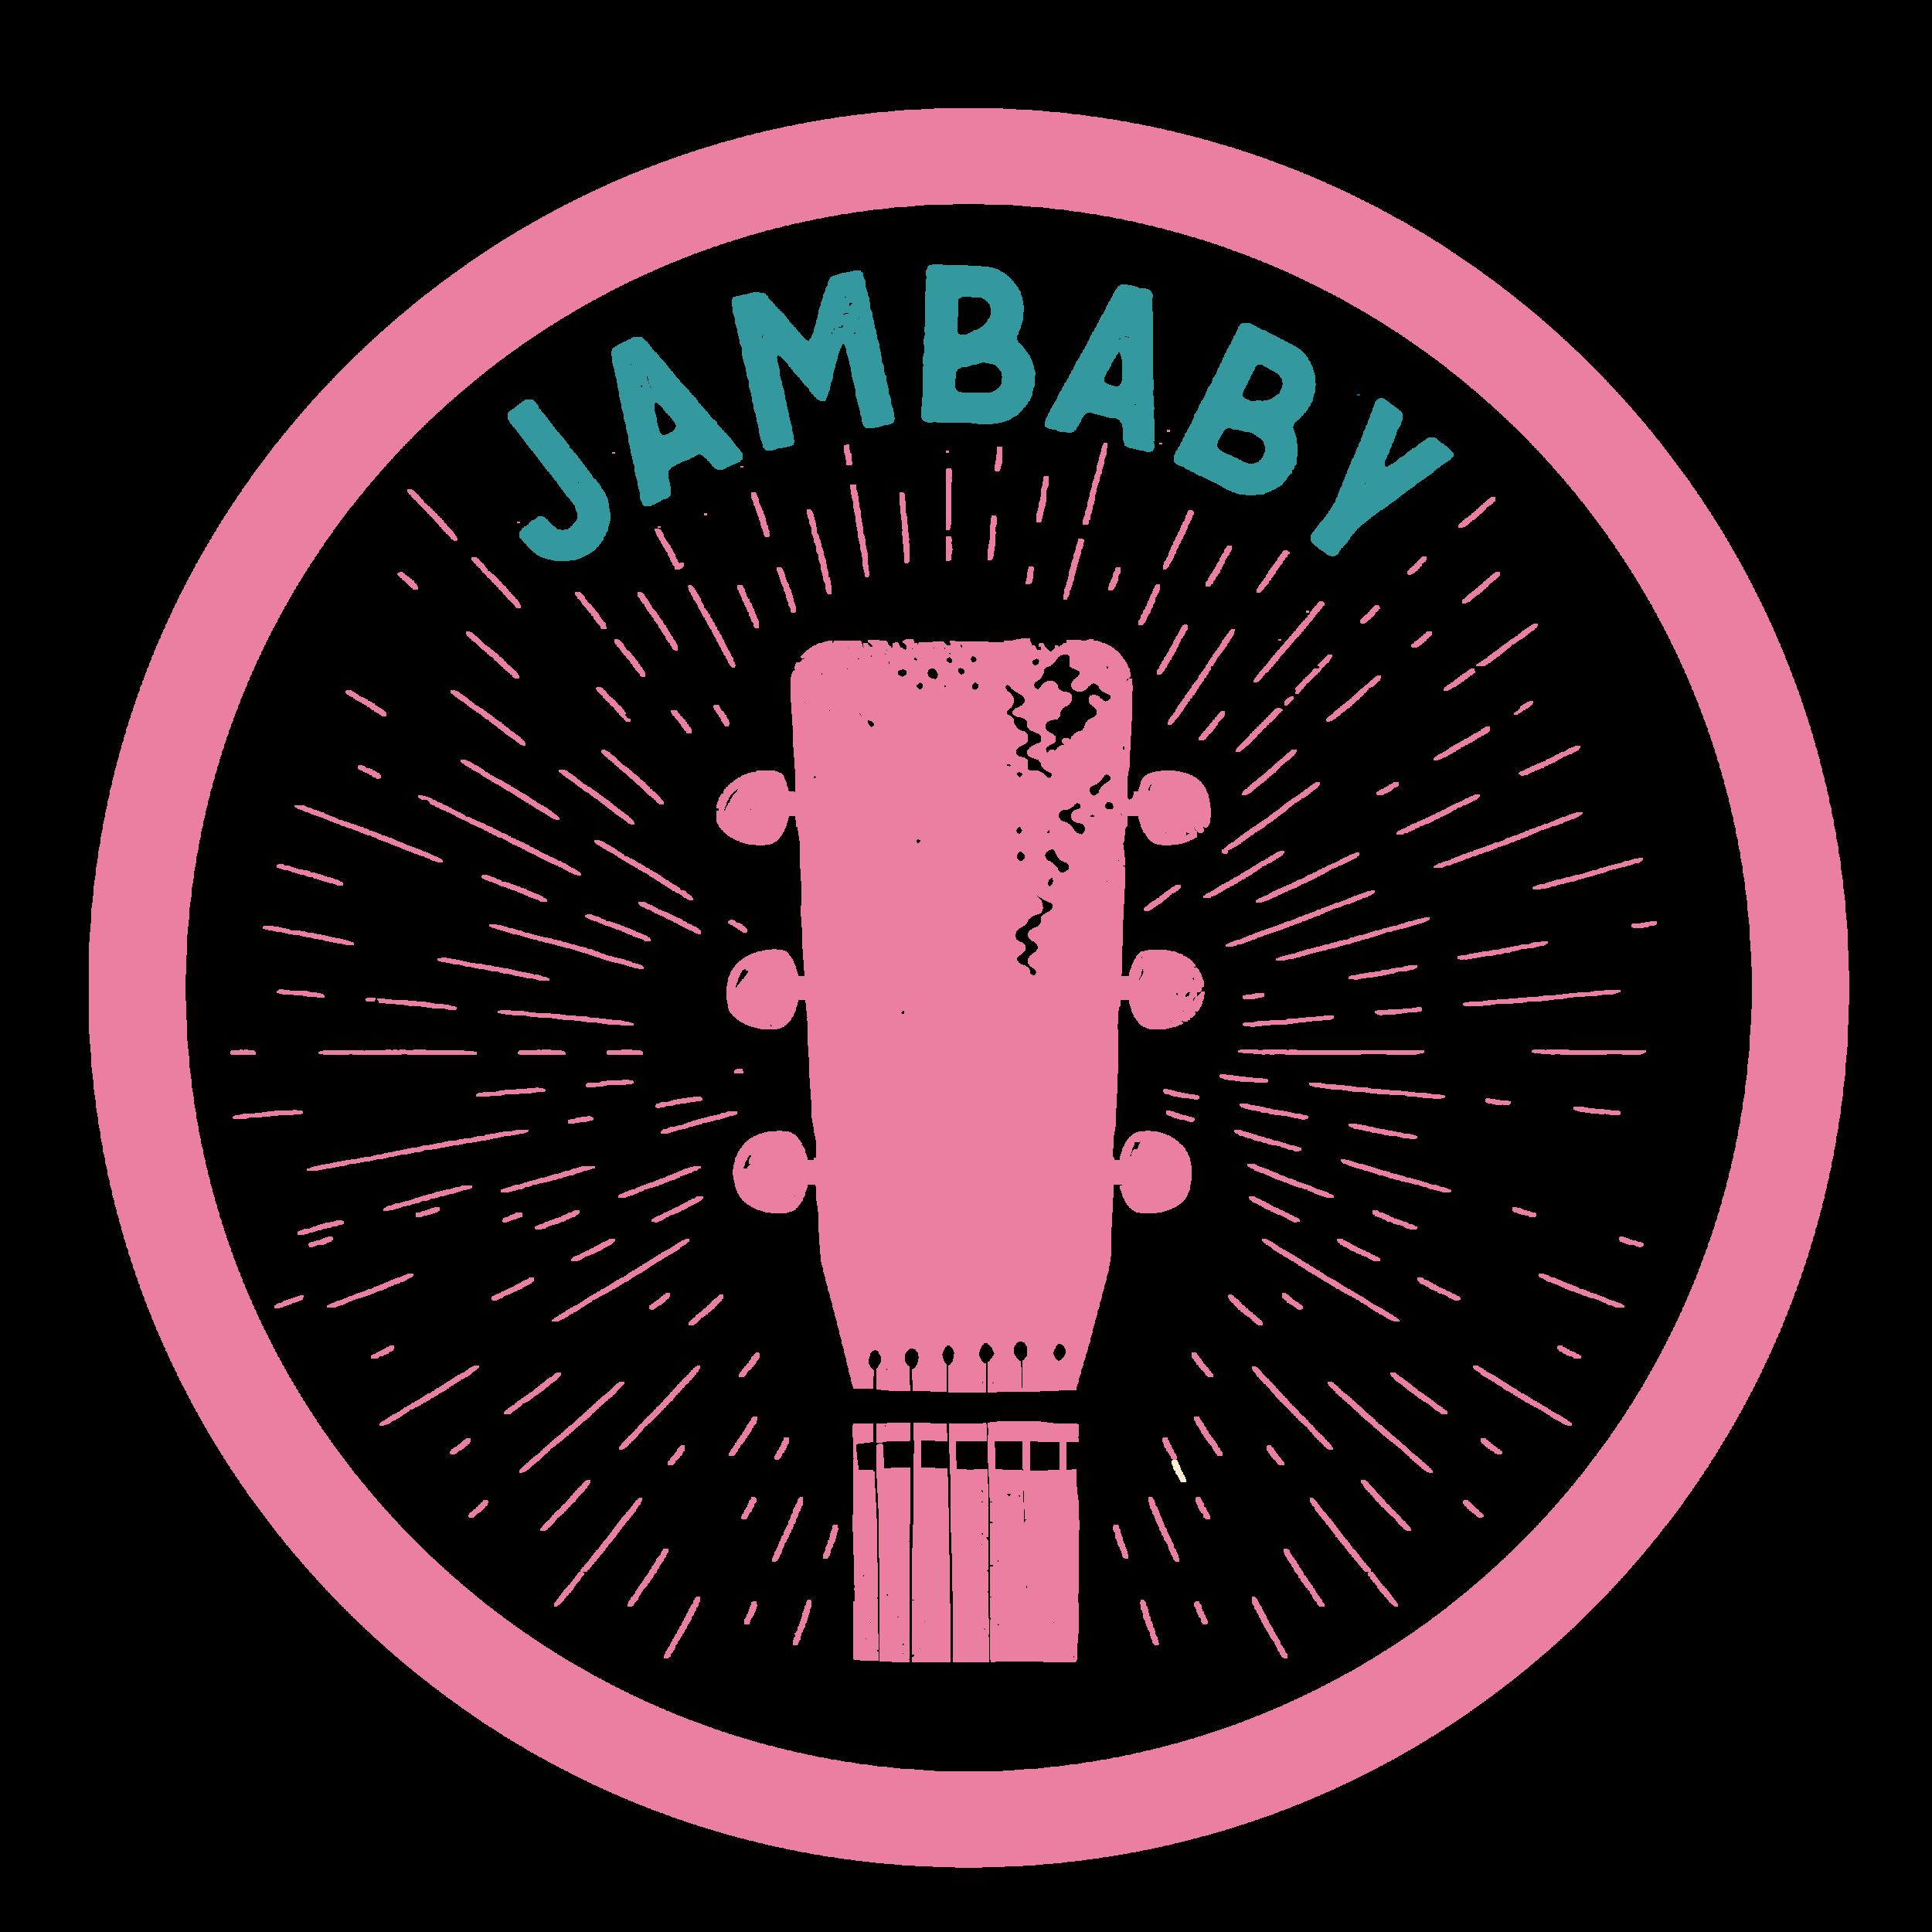 JWY_Classes_JamBaby.png